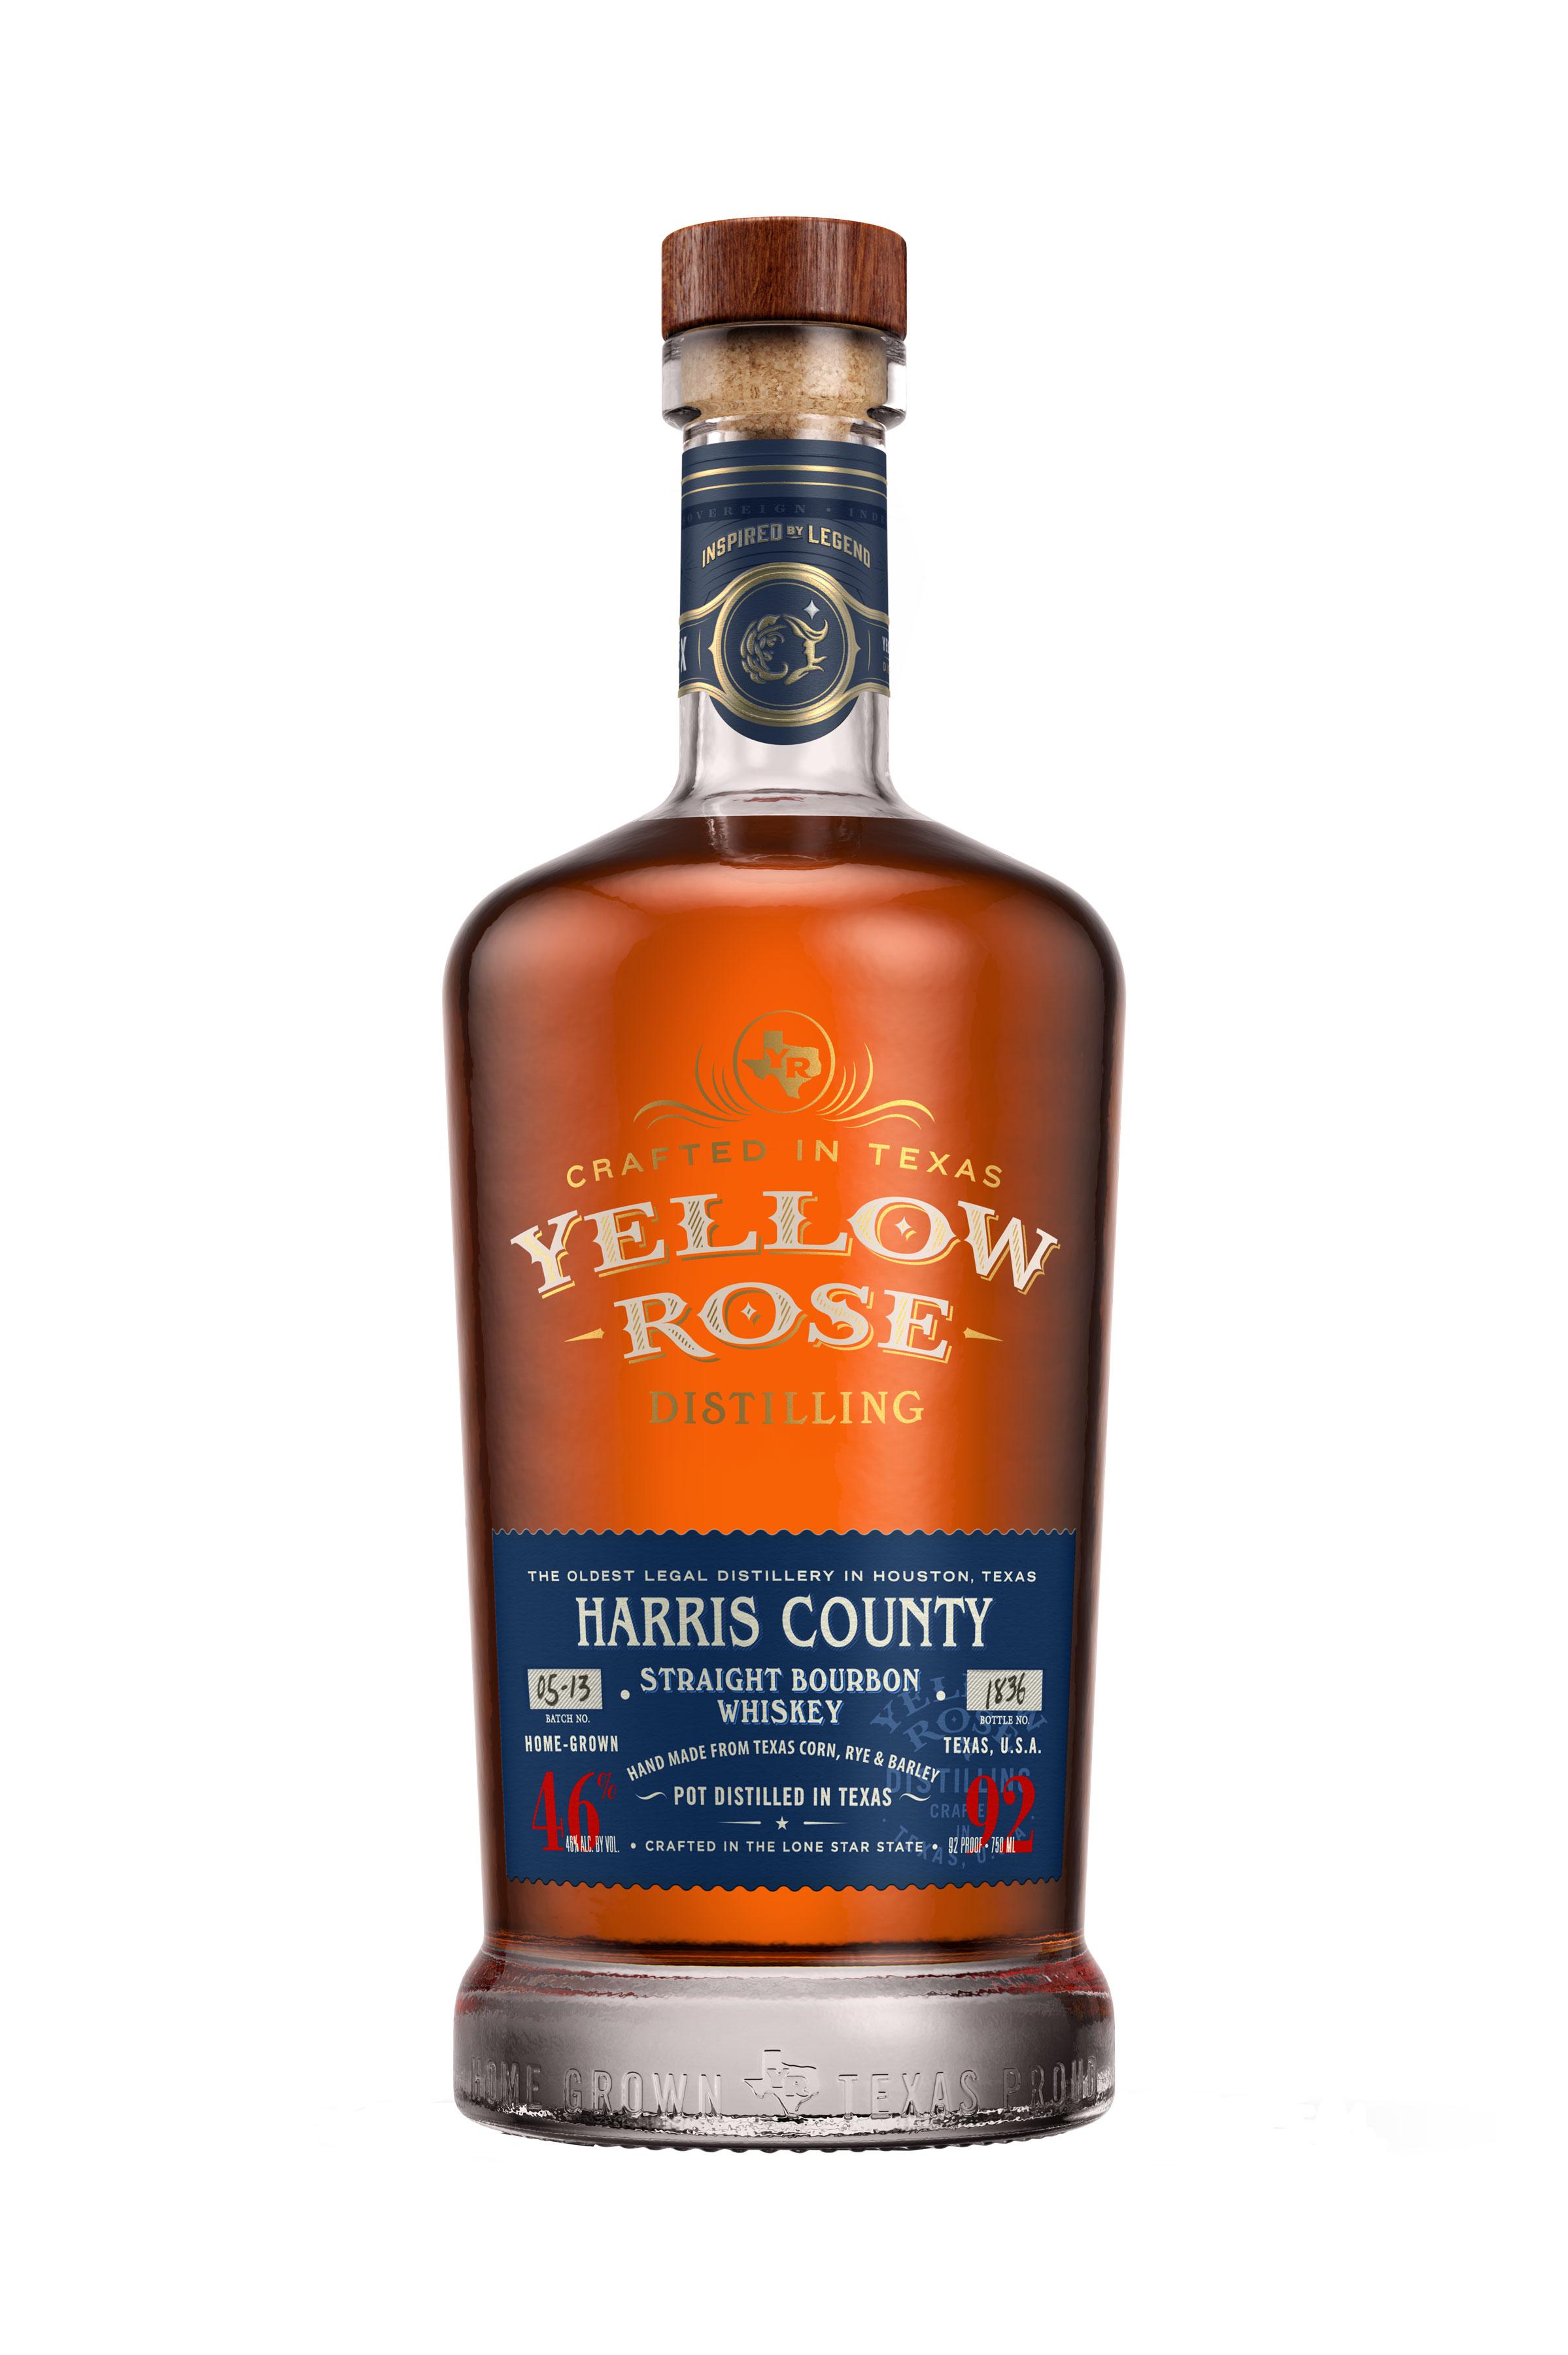 Yellow Rose Harris County Straight Bourbon Whisky 0,7L (46% Vol) - [Enthält Sulfite]